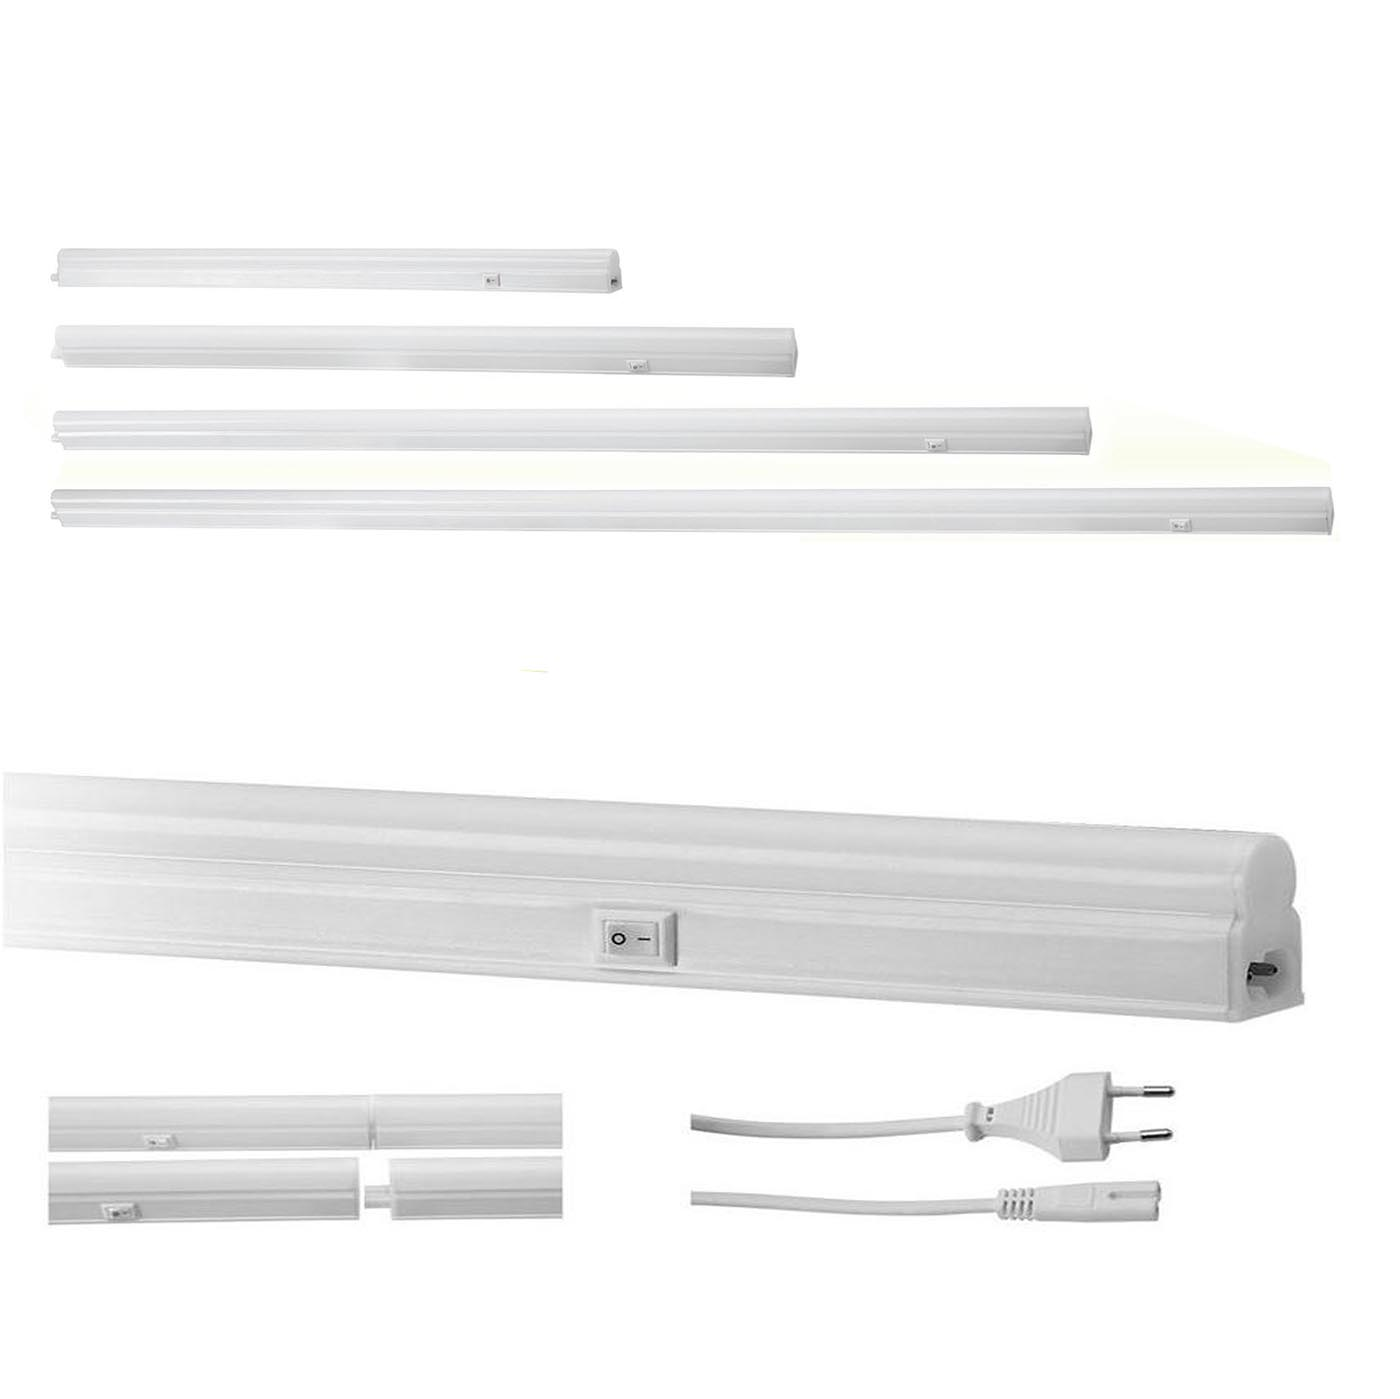 Tubo Led Neon T5 Prova Sito Reglette Led T5 Lampada